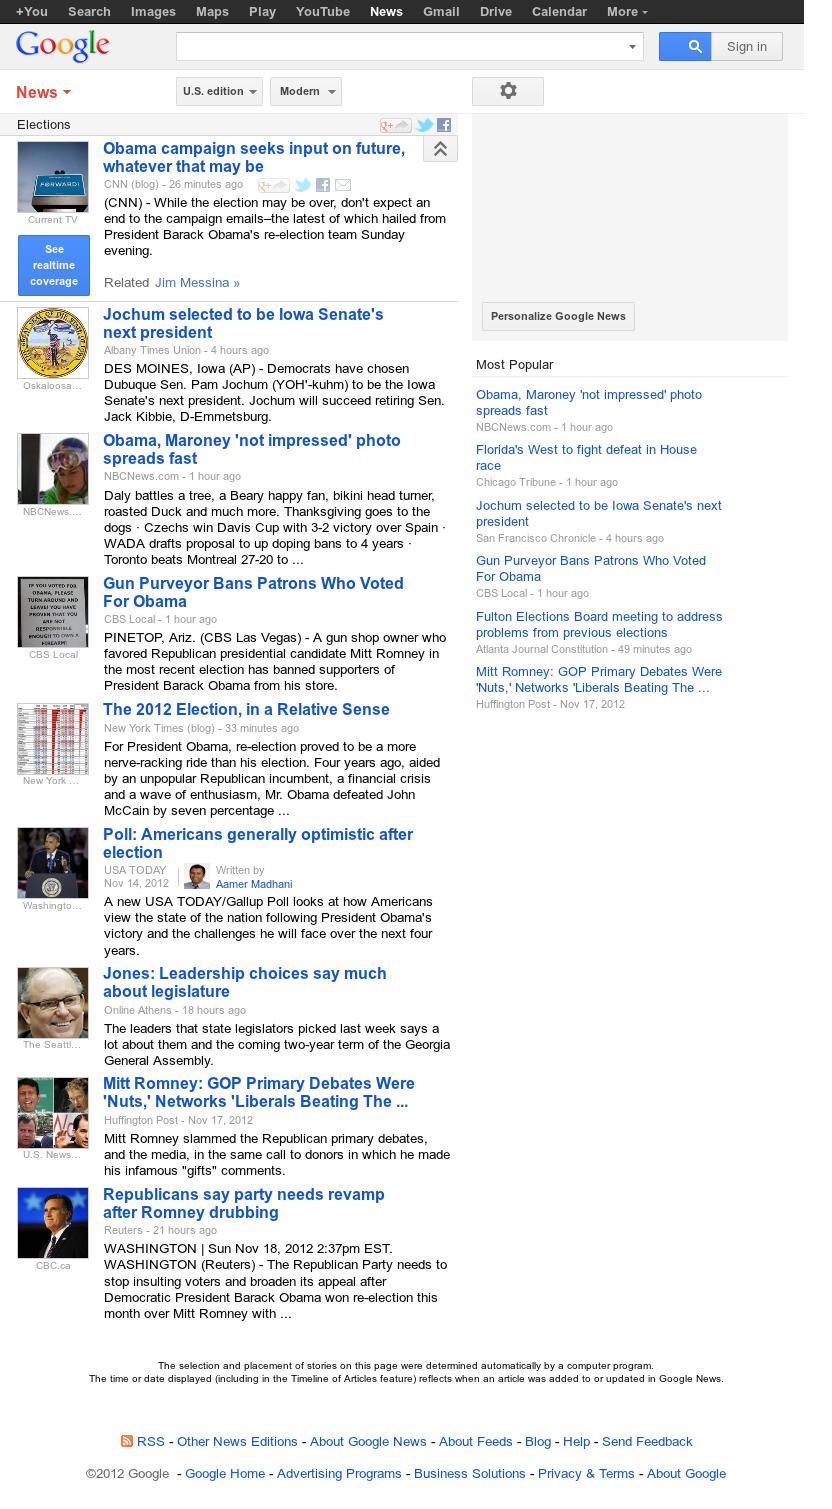 Google News: Elections at Monday Nov. 19, 2012, 5:12 p.m. UTC